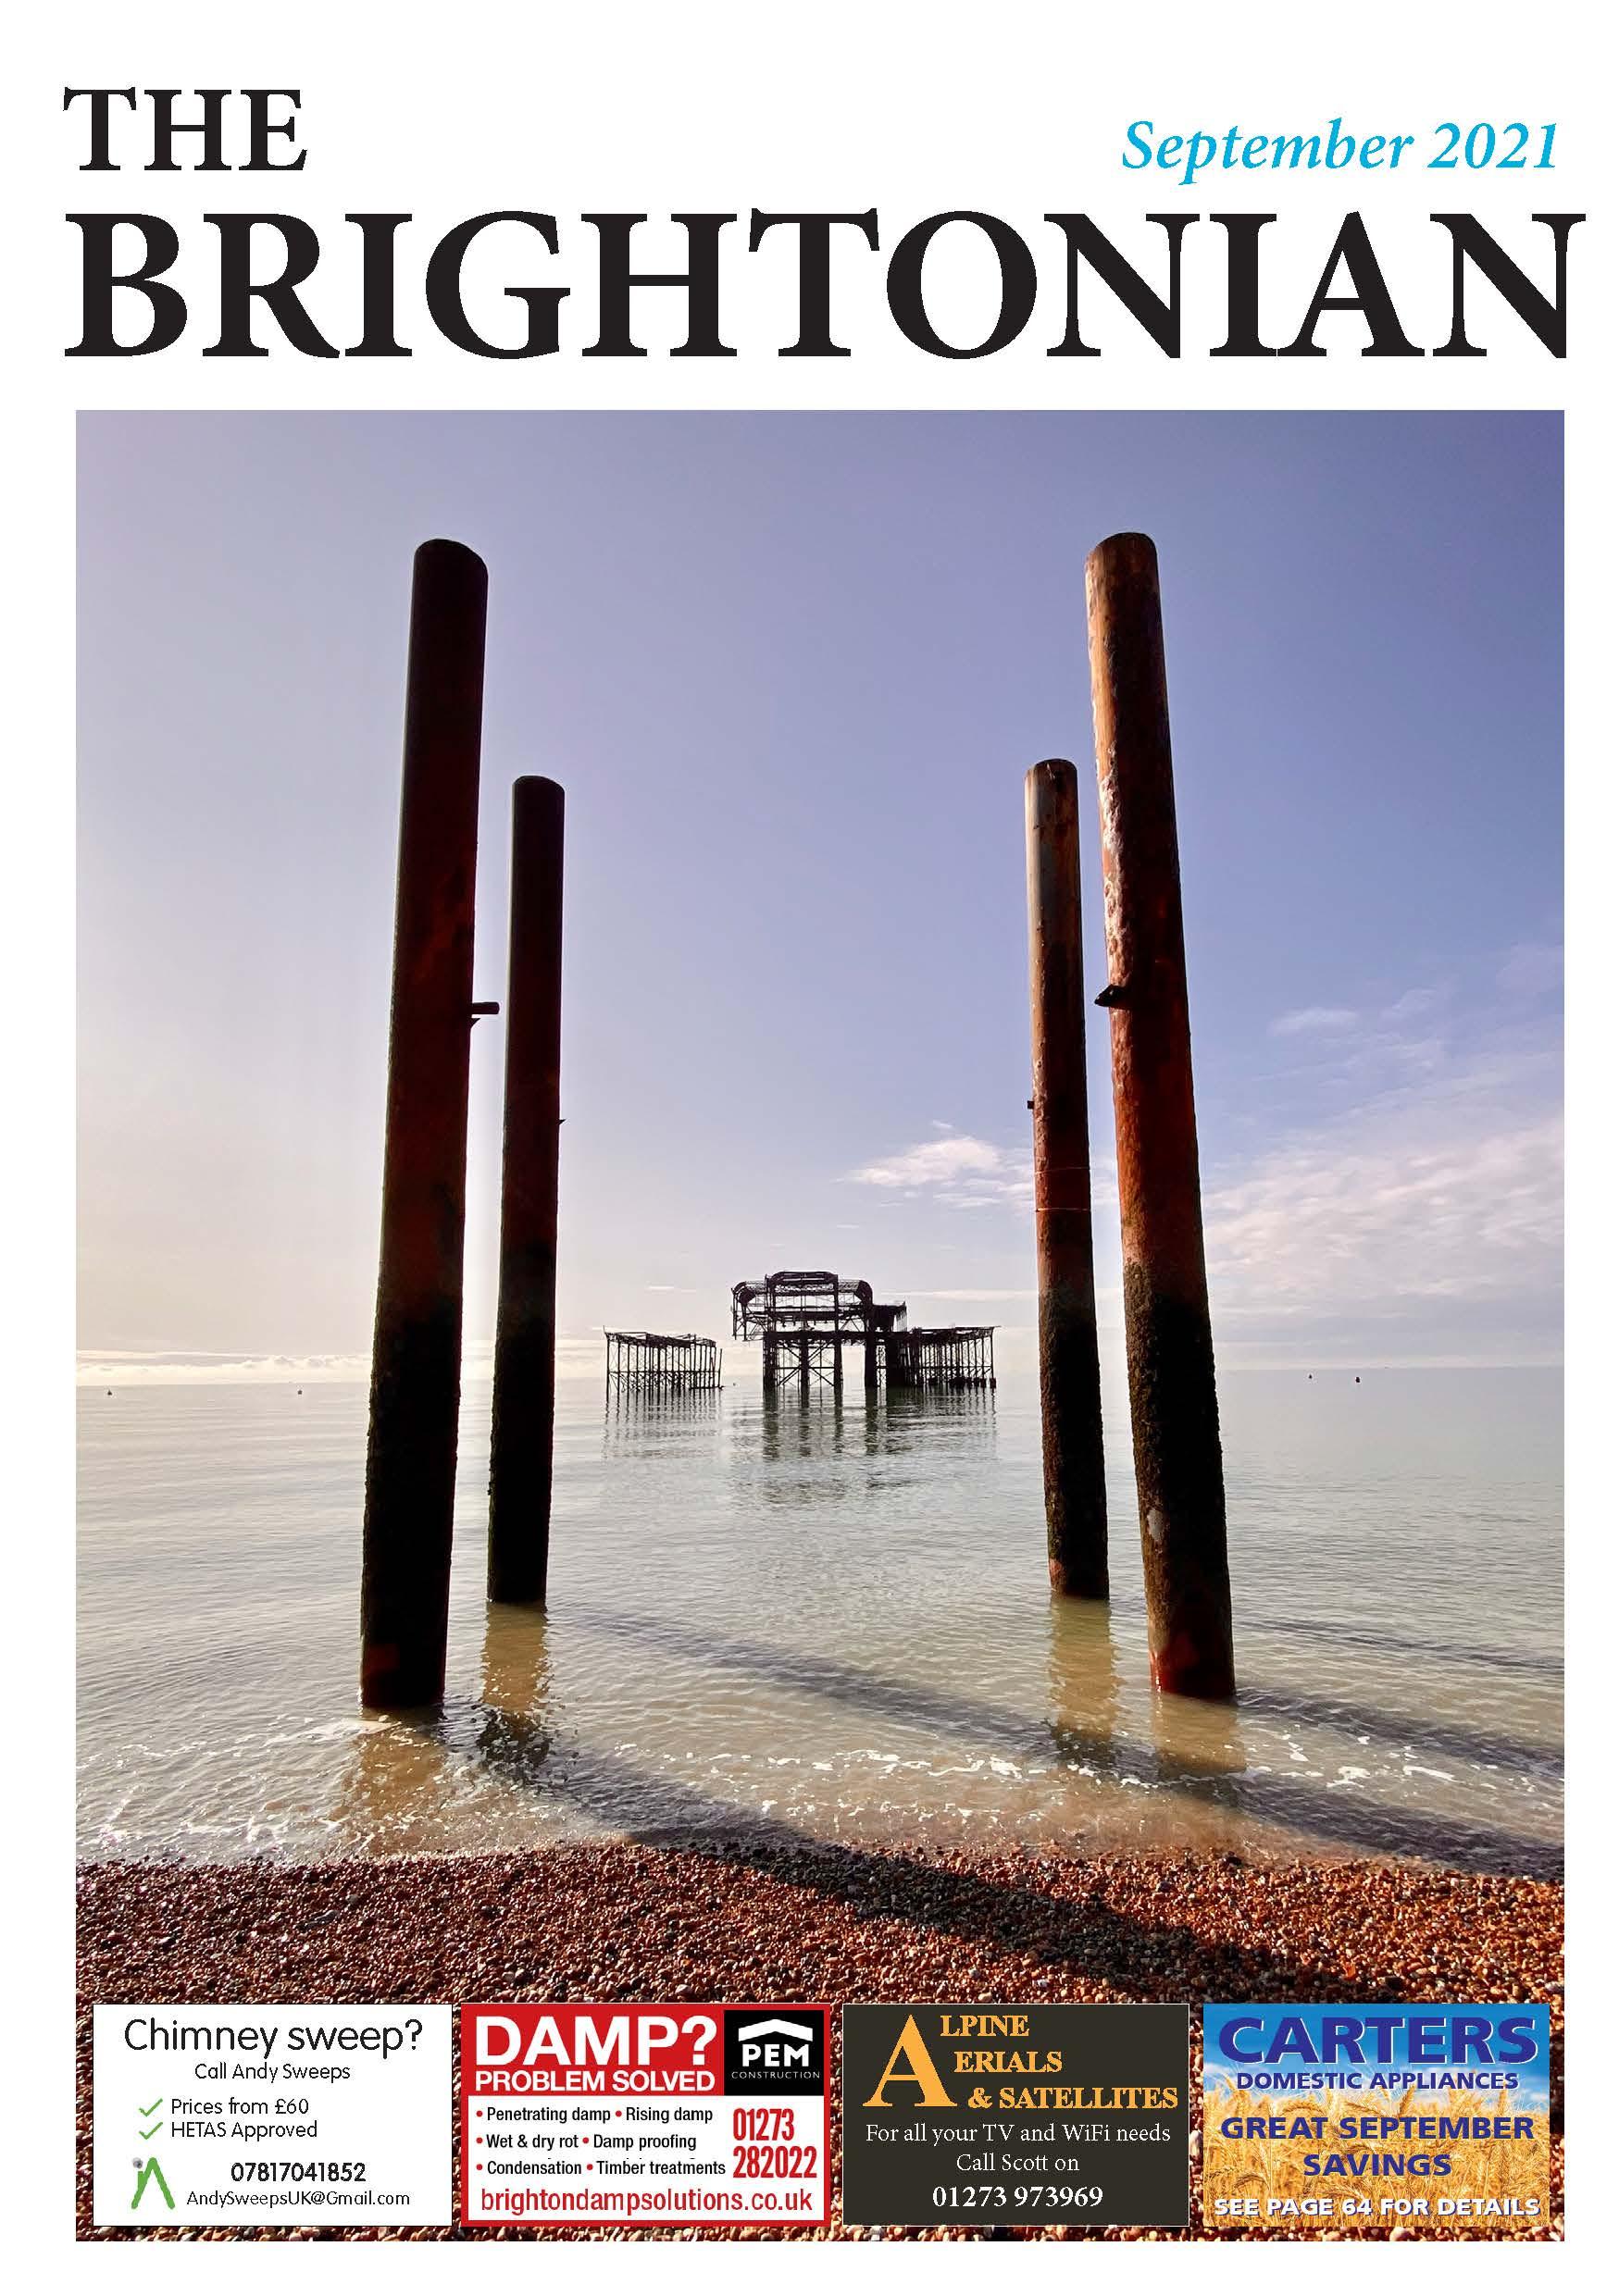 The Brightonian